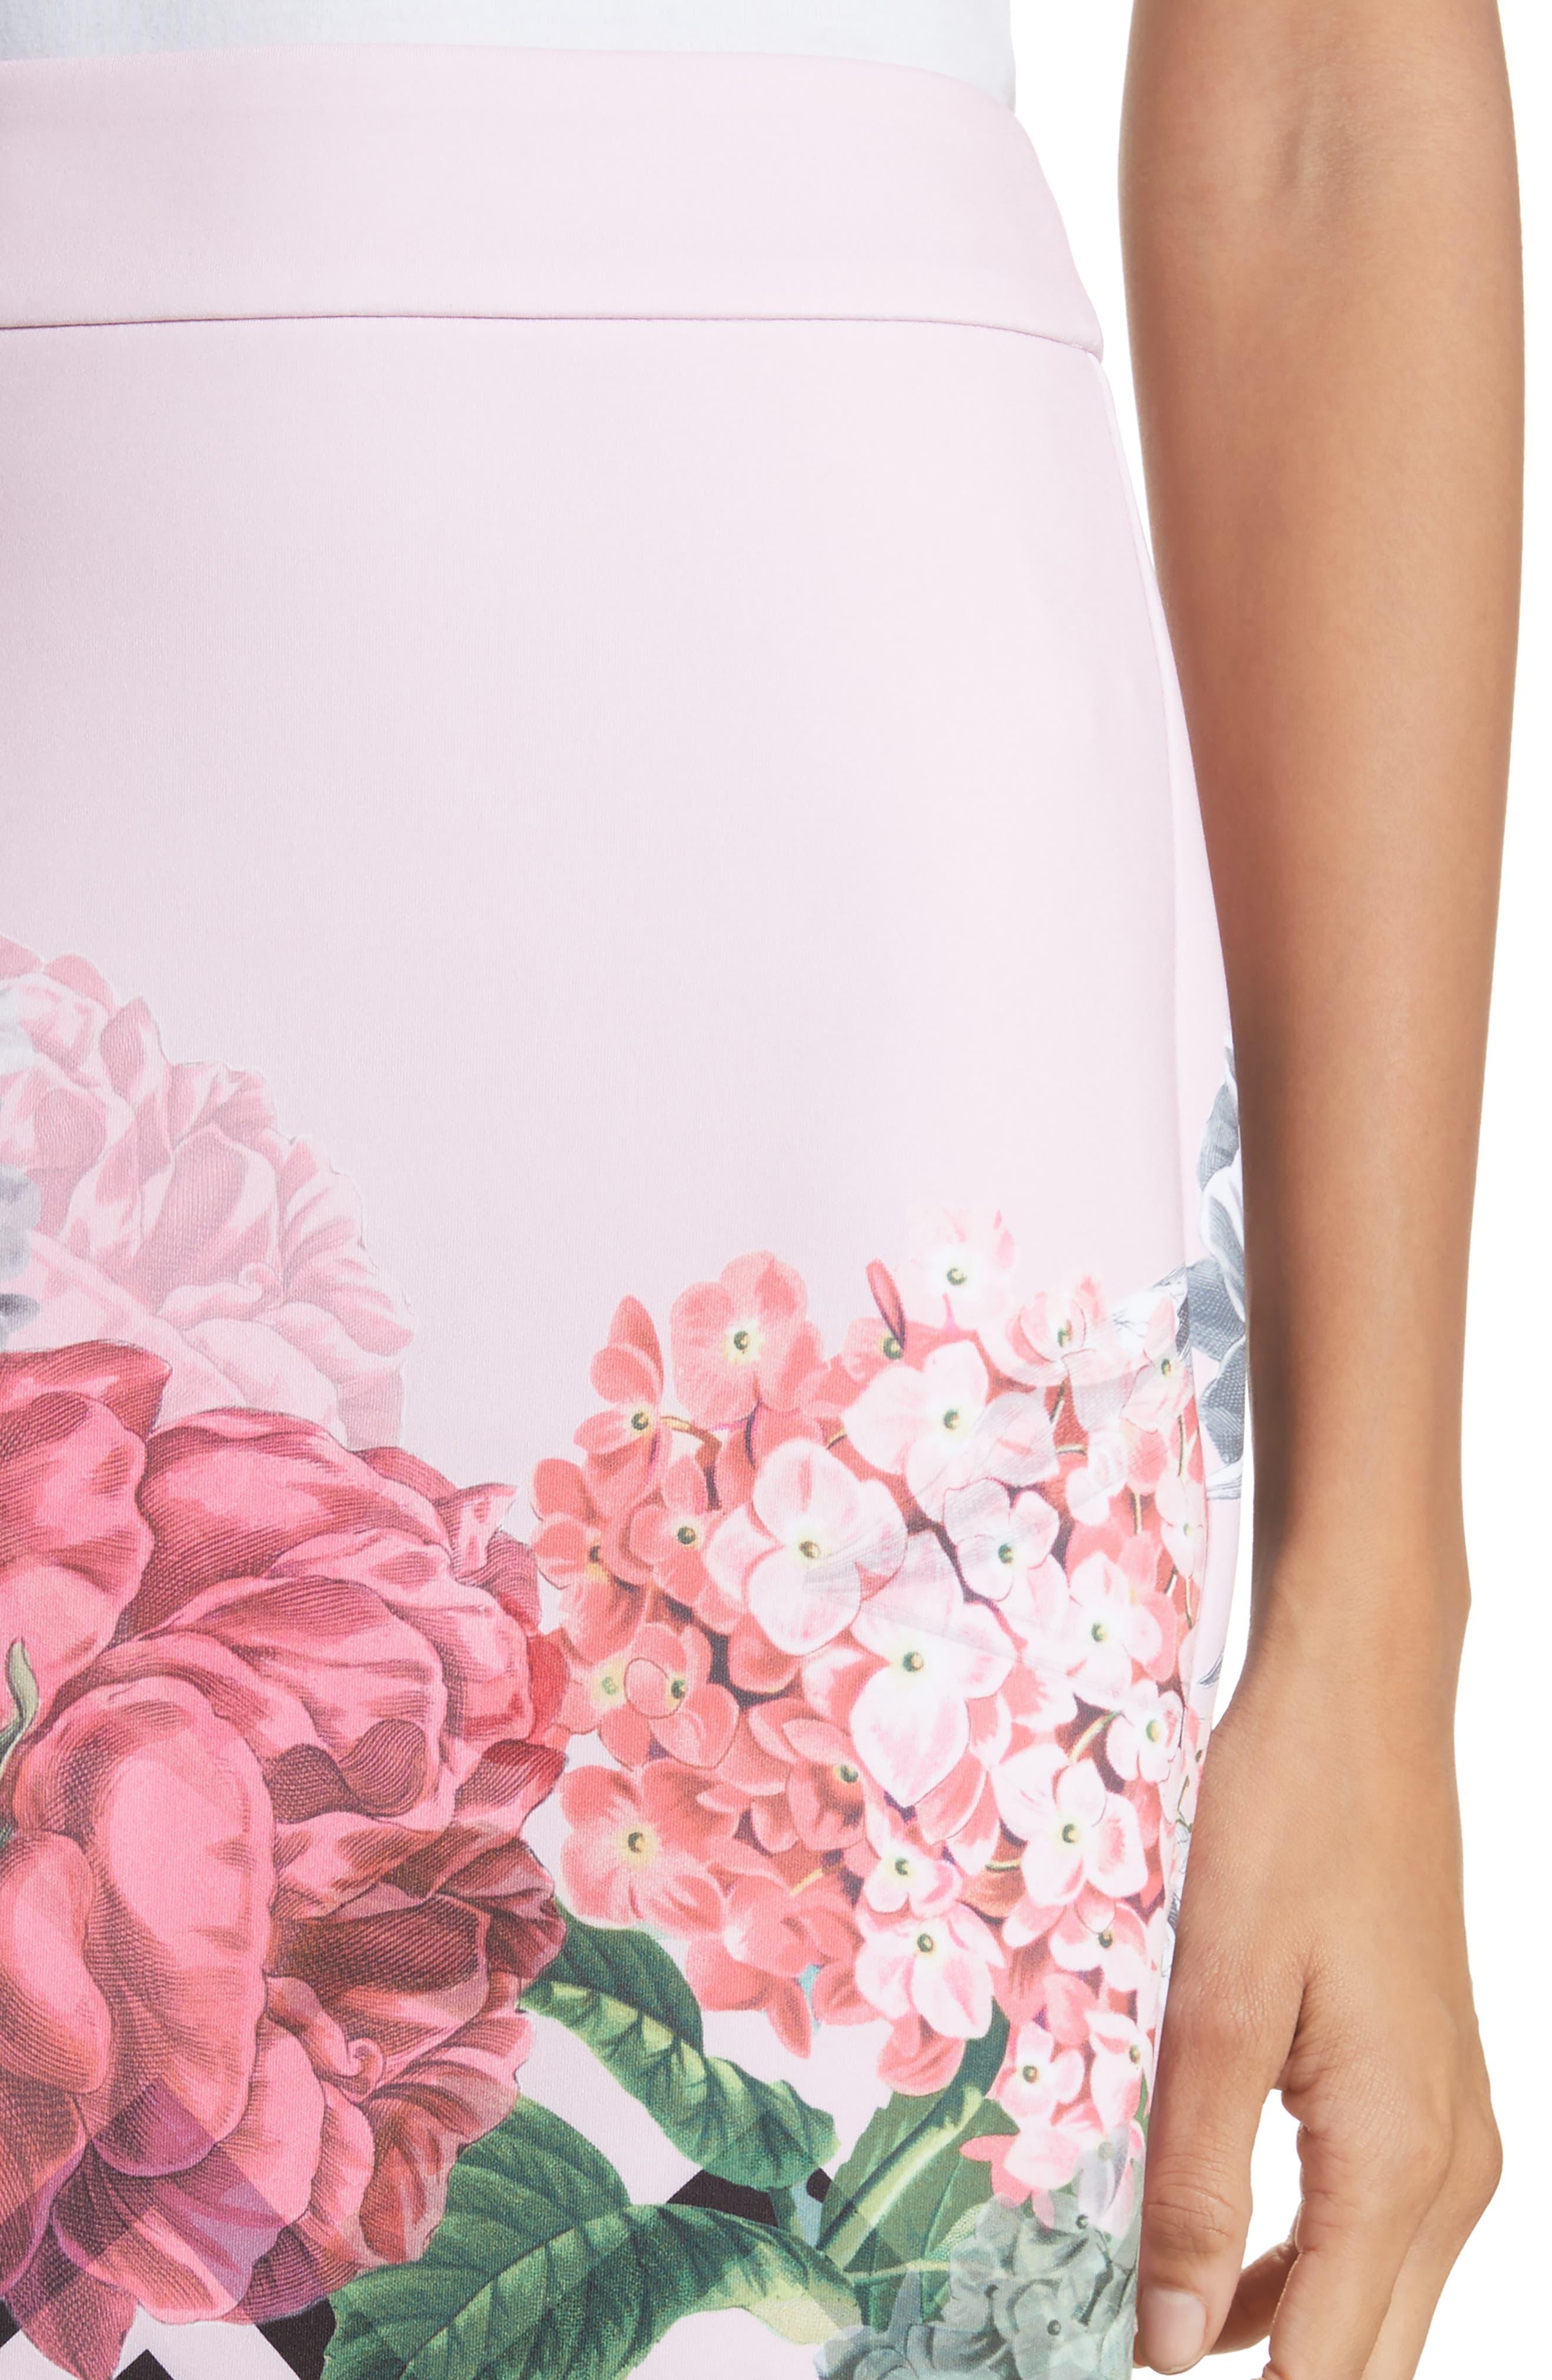 Soella Pencil Skirt,                             Alternate thumbnail 4, color,                             Pale Pink